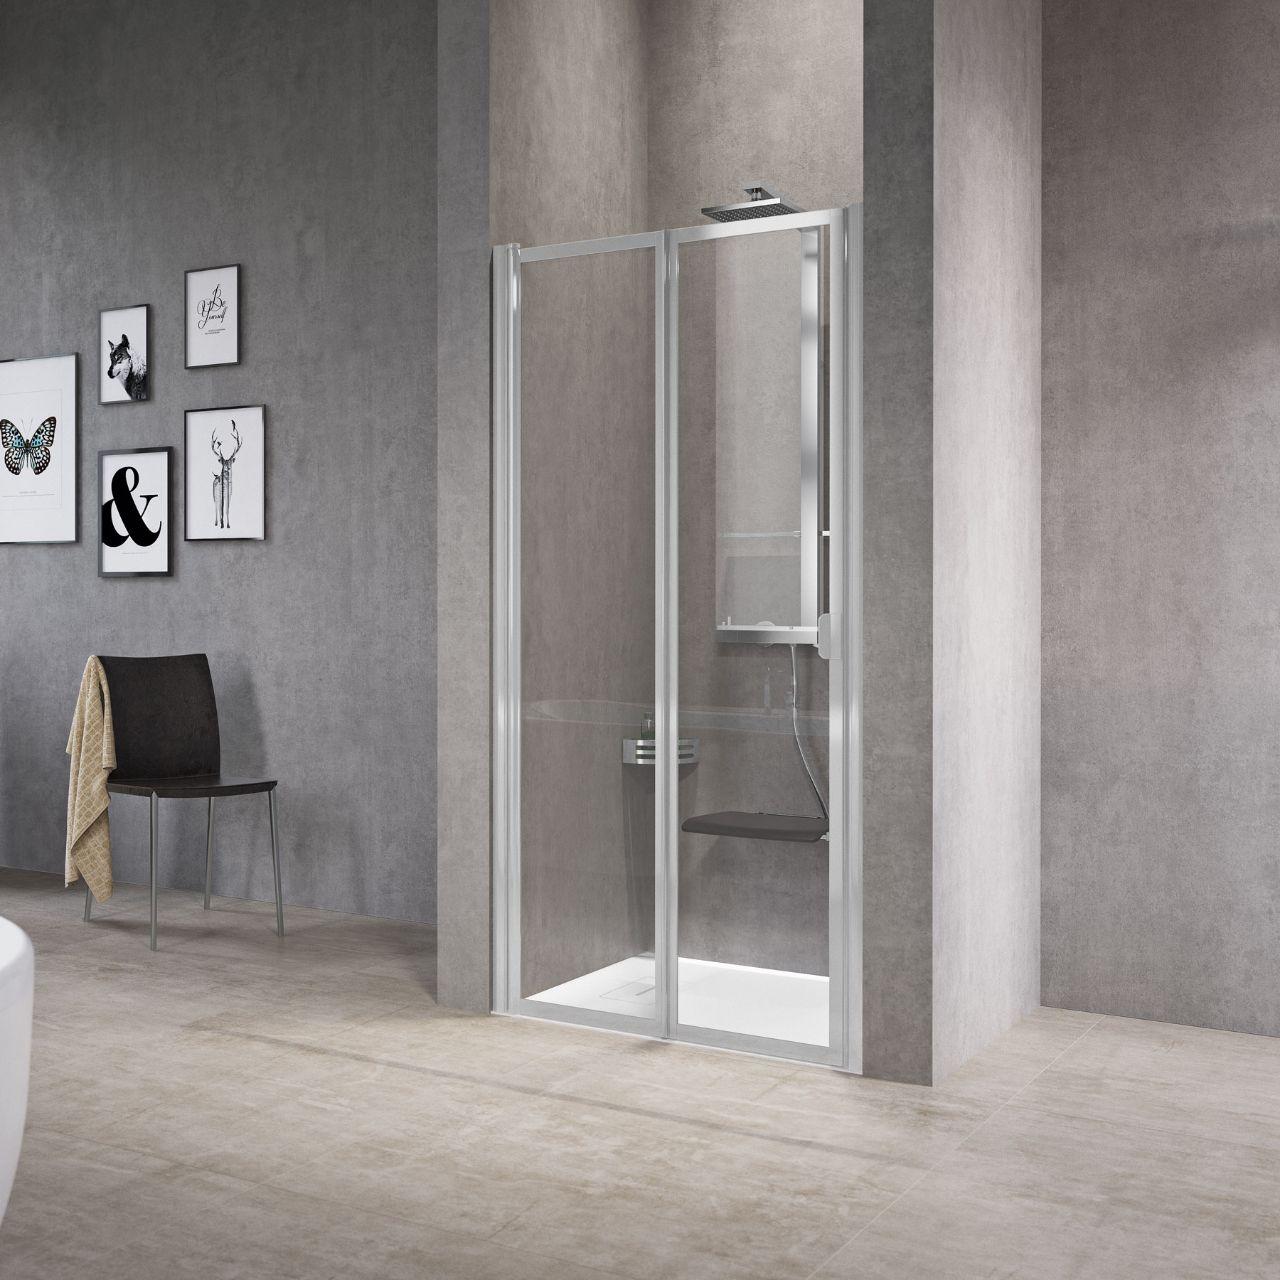 Cabinas De Ducha Novellini:Mamparas de ducha Free2 P – Versión alta – Novellini